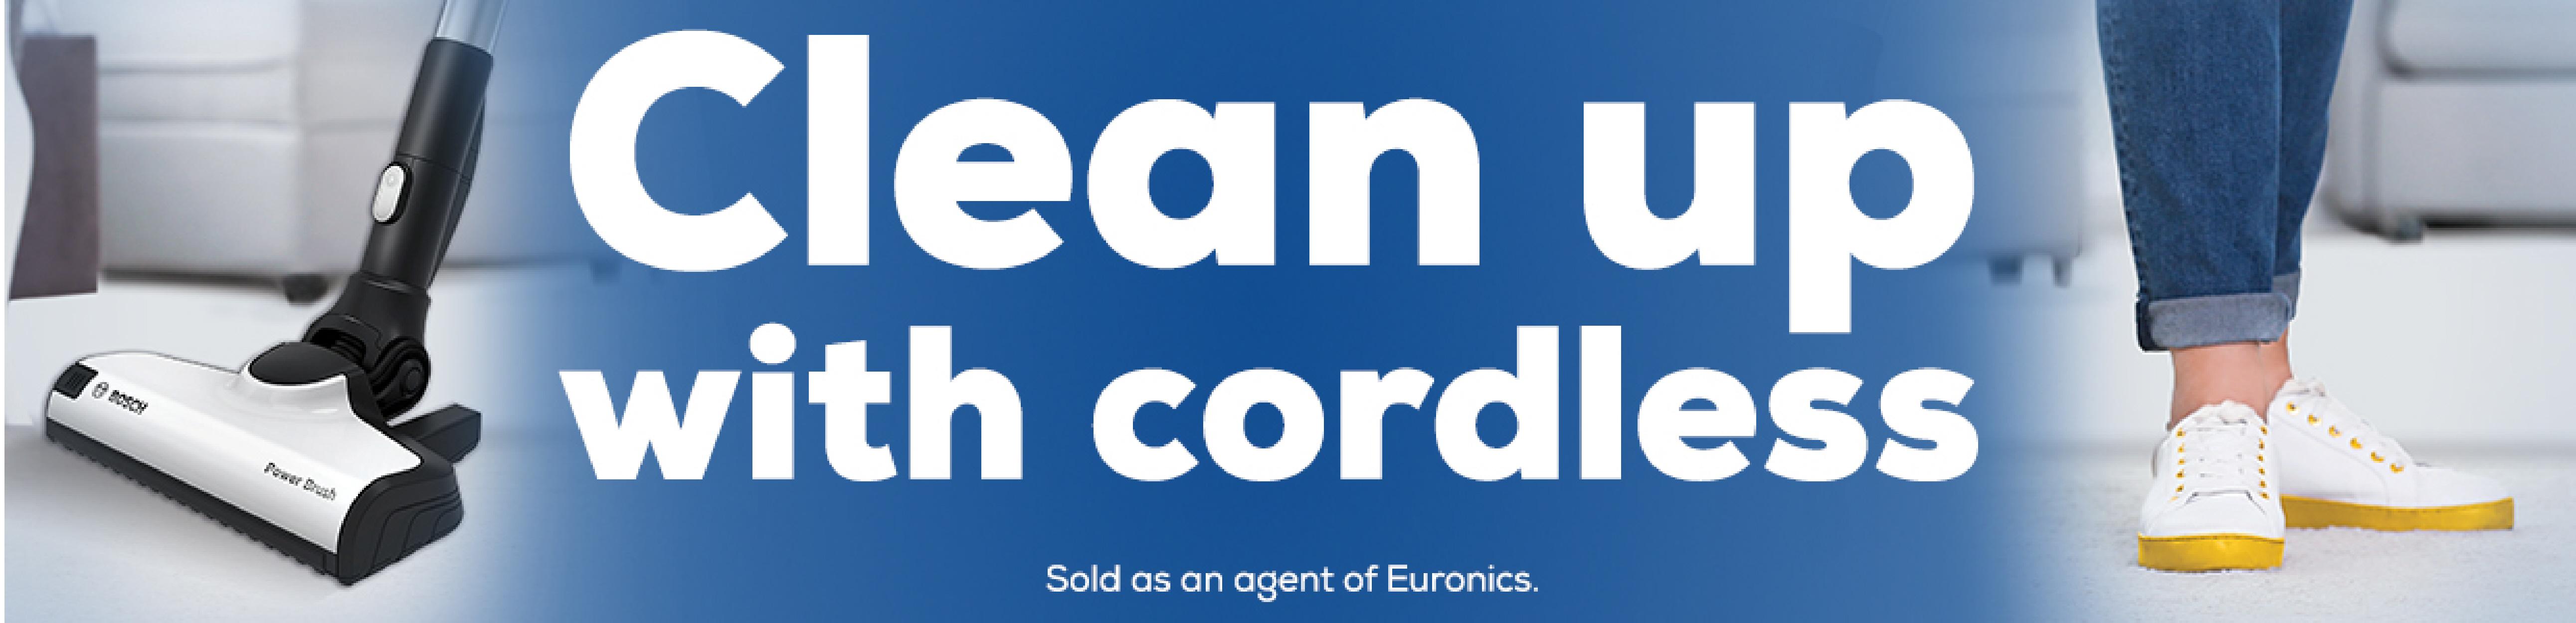 Euronics Cordless Vacuums